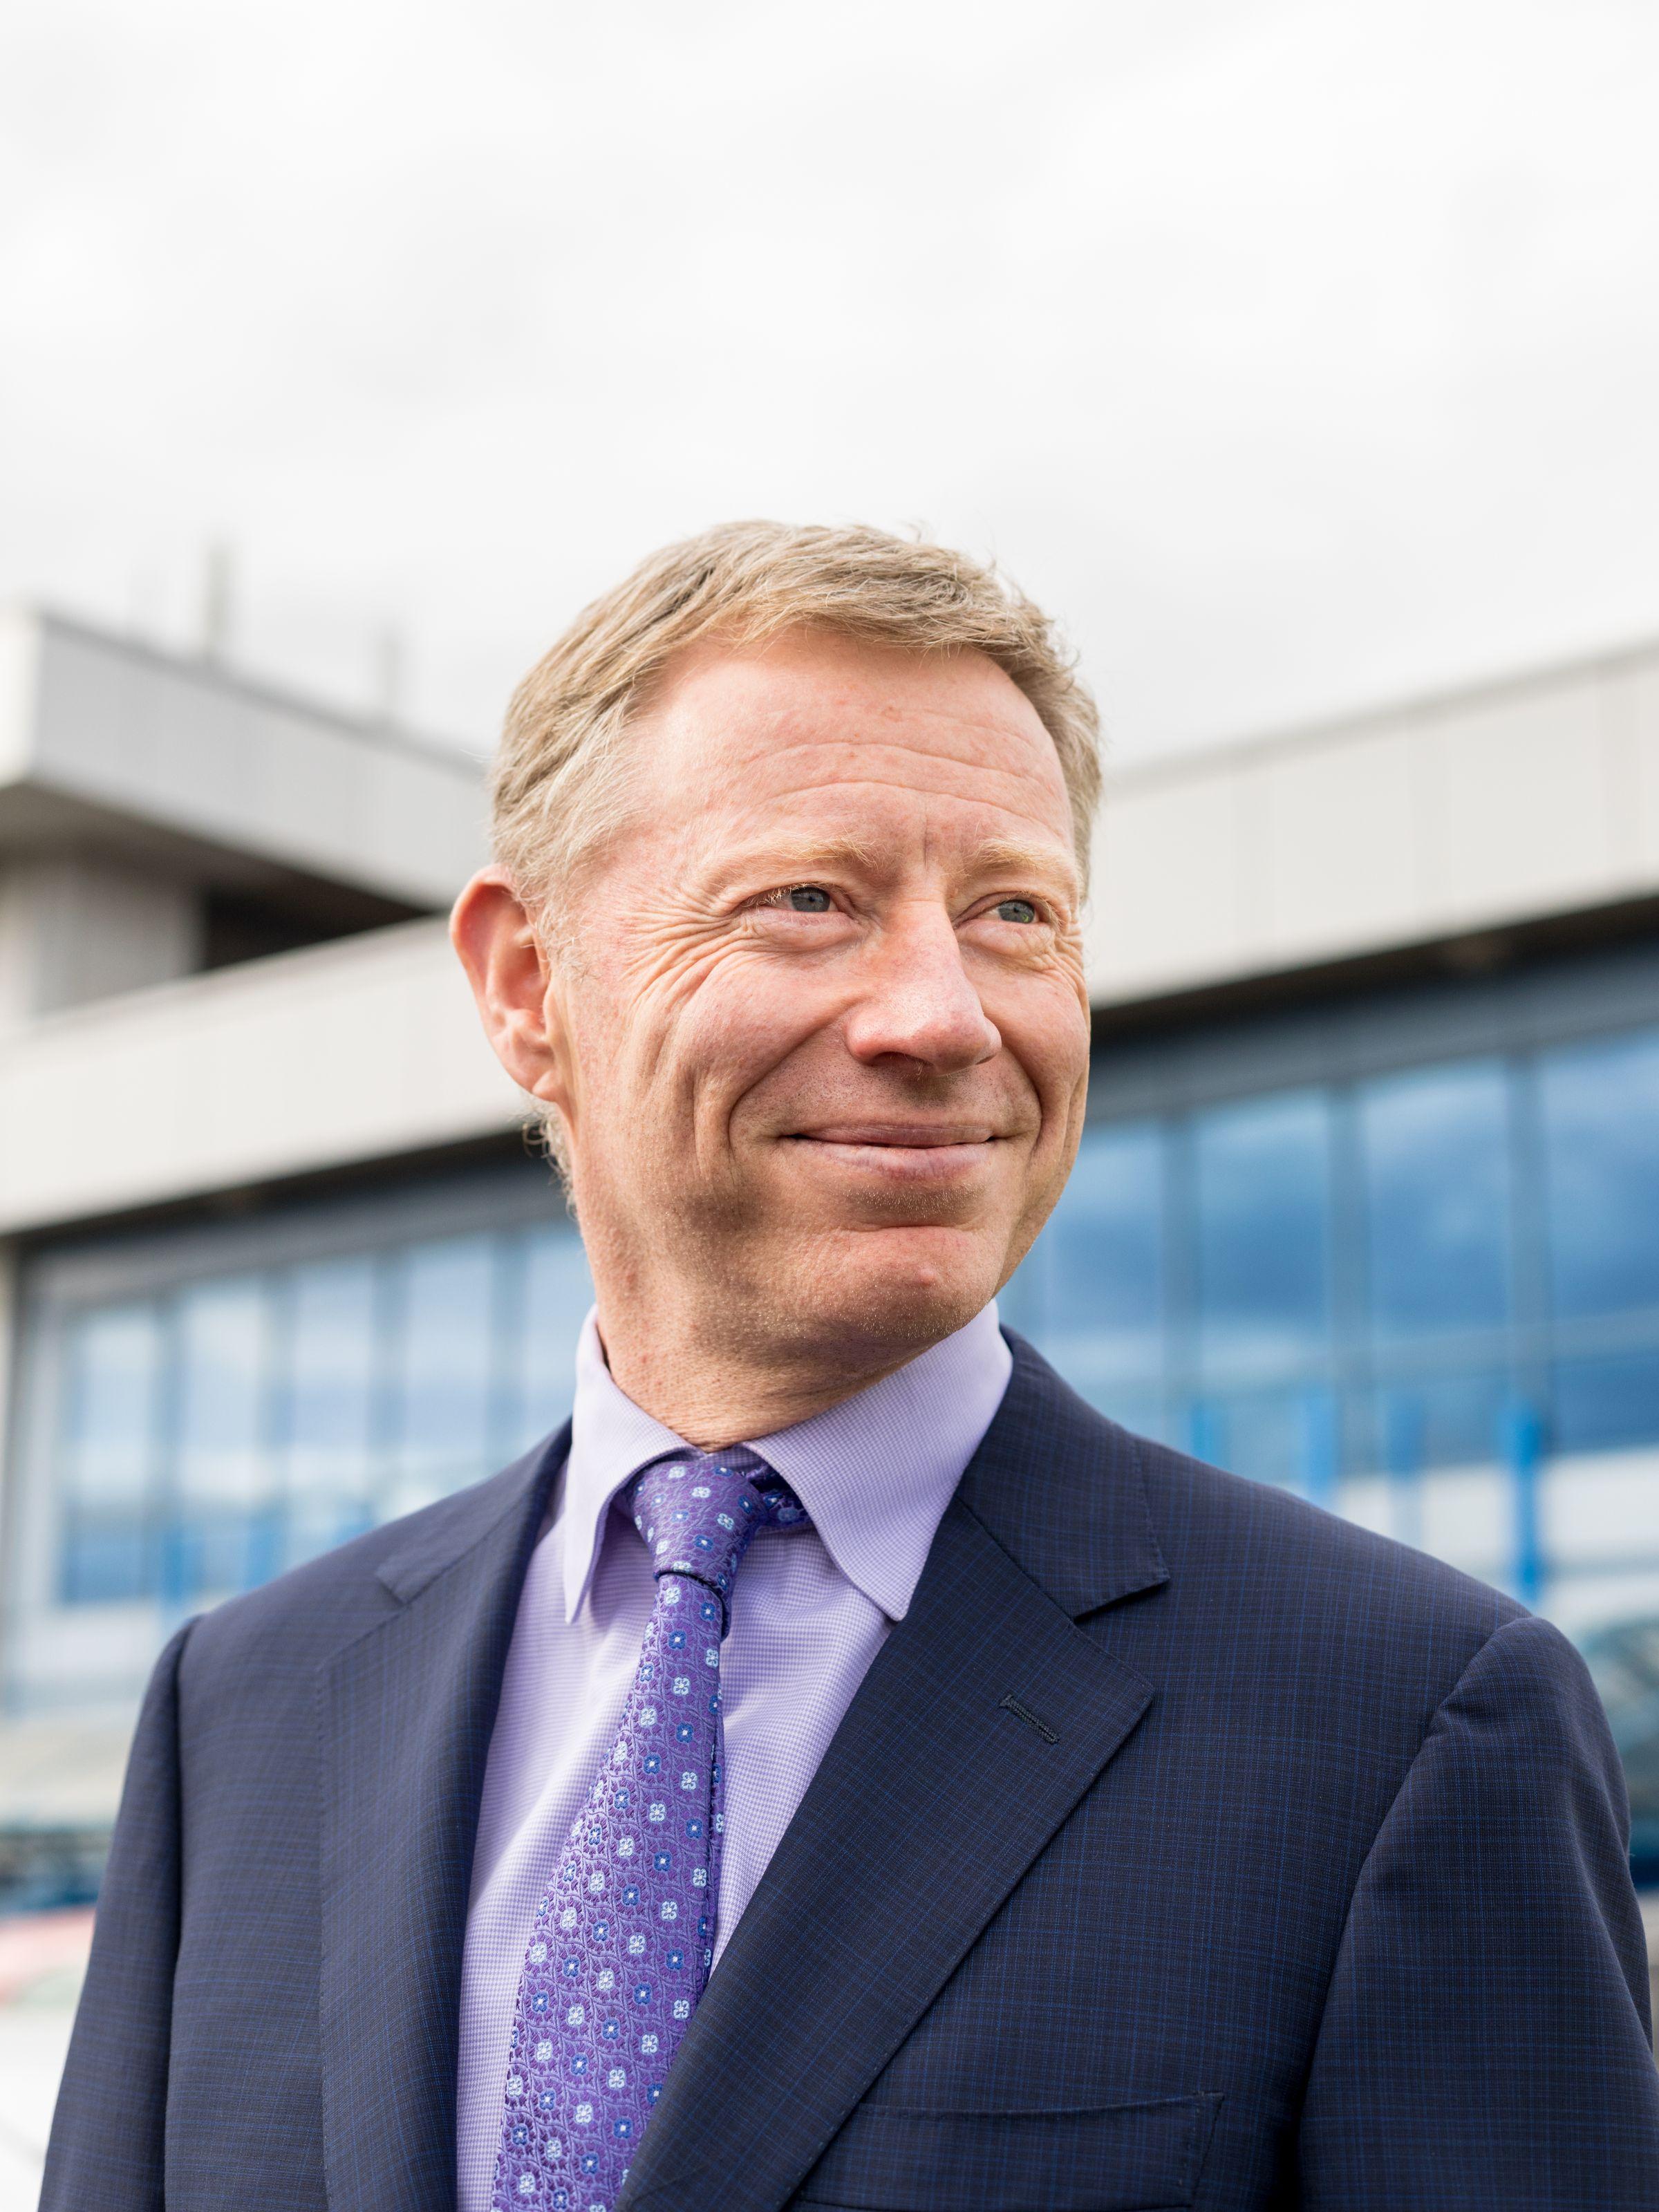 Robert Sinclair, London City Airport CEO